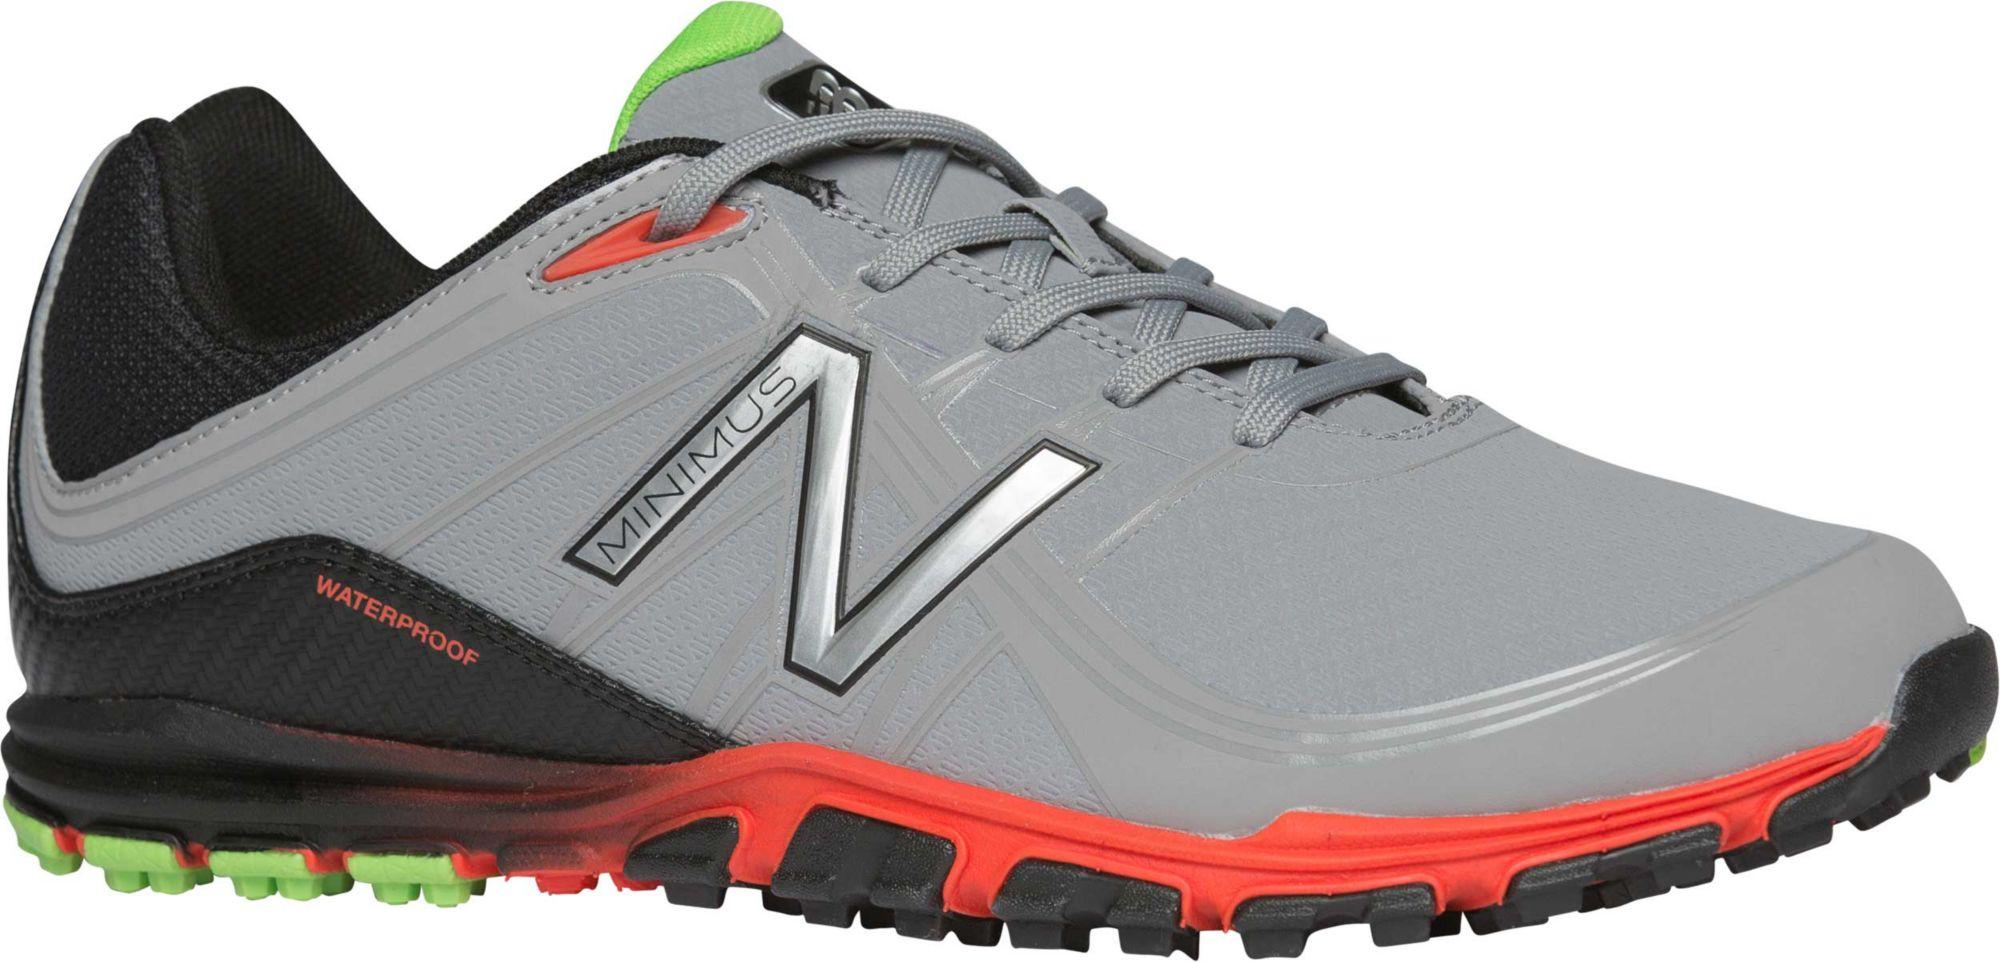 New-Balance-NBG1005-Minimus-Mens-Golf-Shoes-Pick-